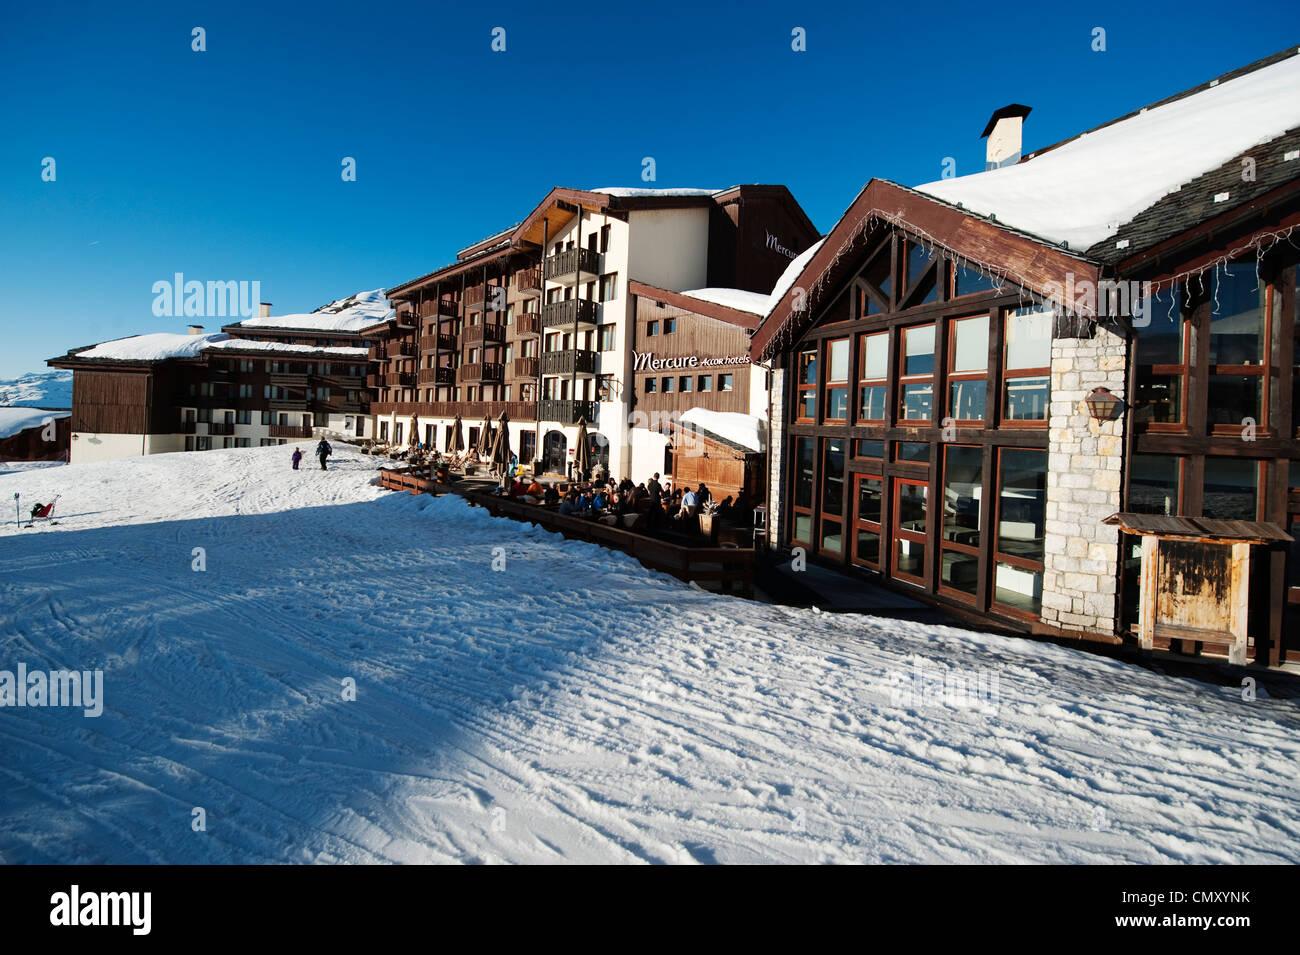 ski in ski out accor hotels mercure at belle plagne altitude ski